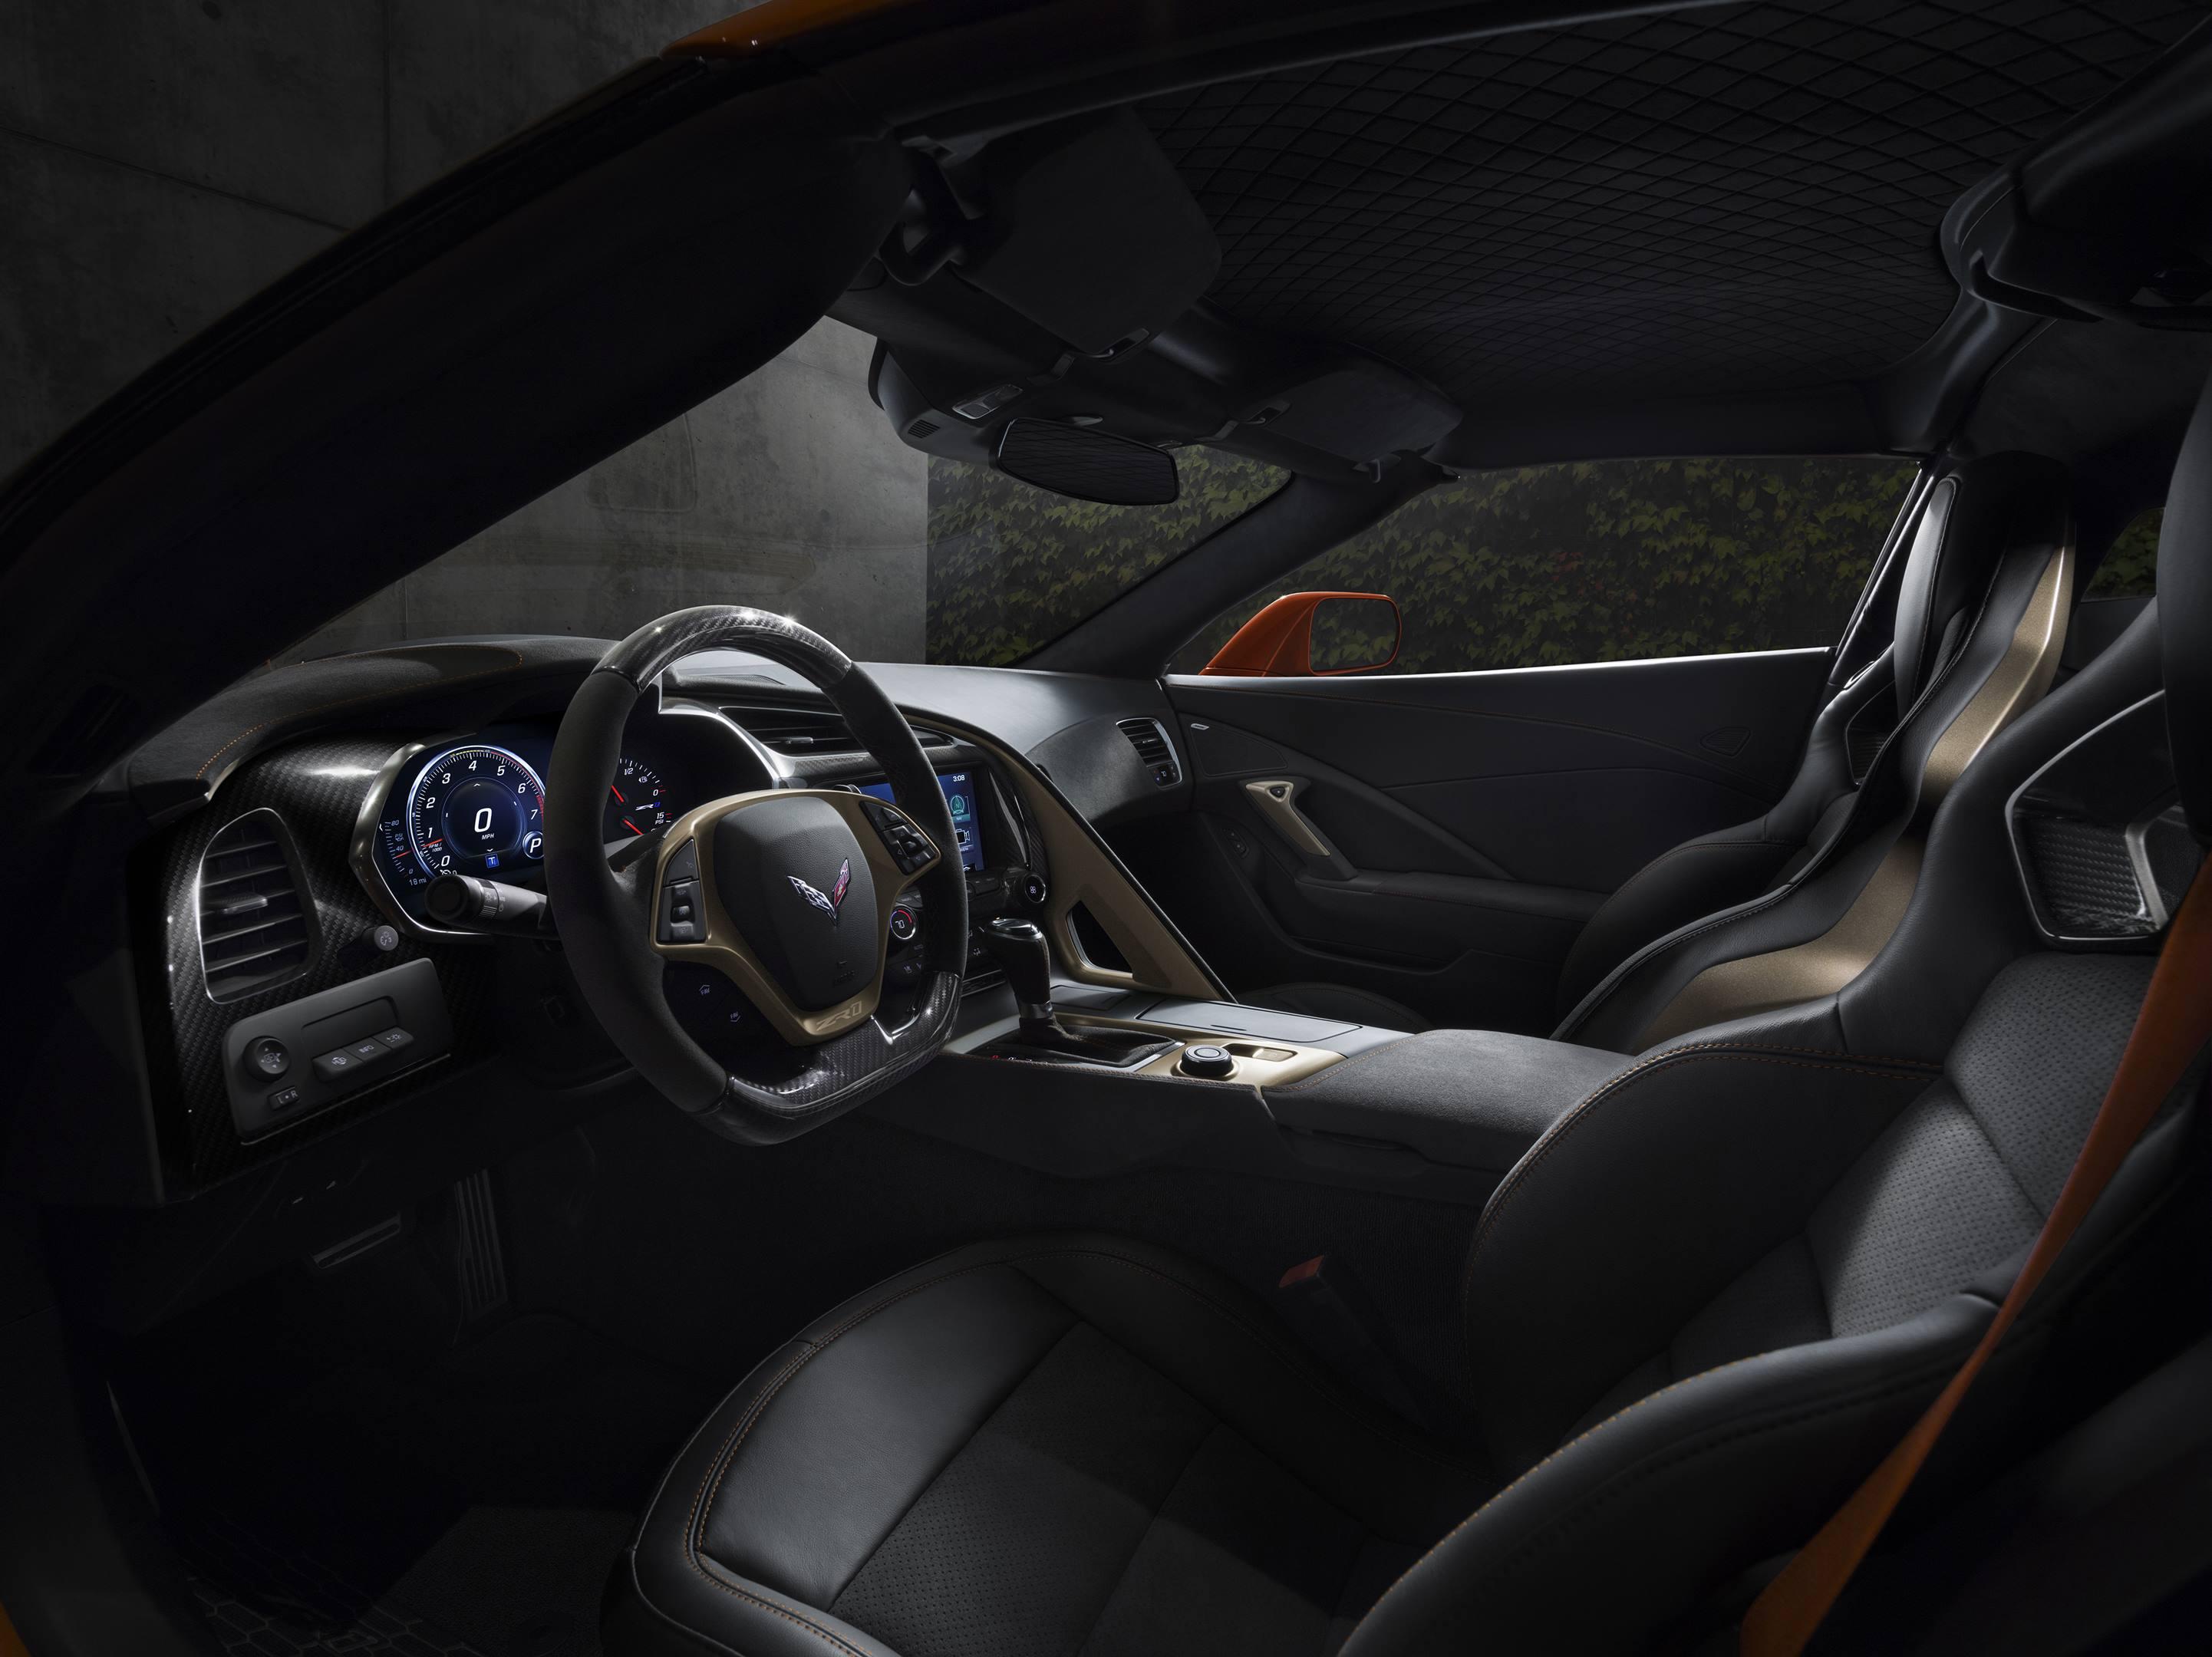 2019 Chevrolet Corvette ZR1  Interior detail shot